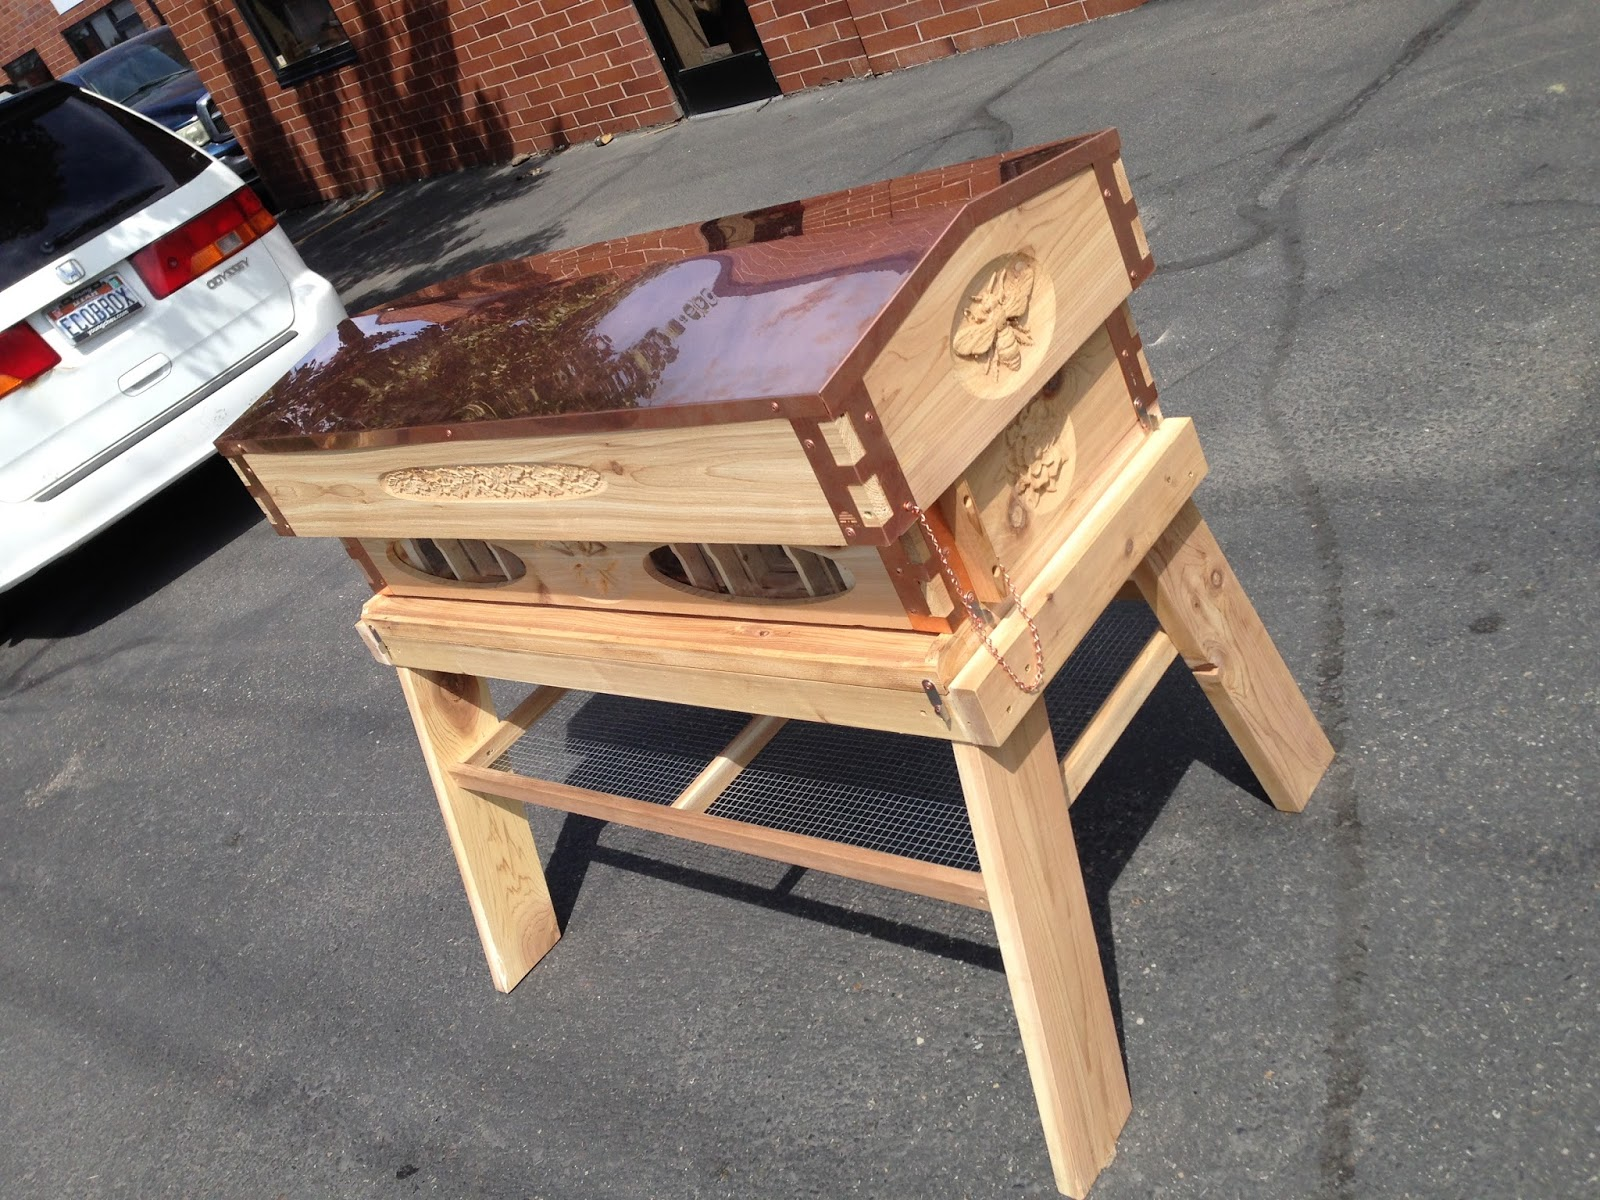 Langstroth Top Bar Long Box by Eco Bee Box